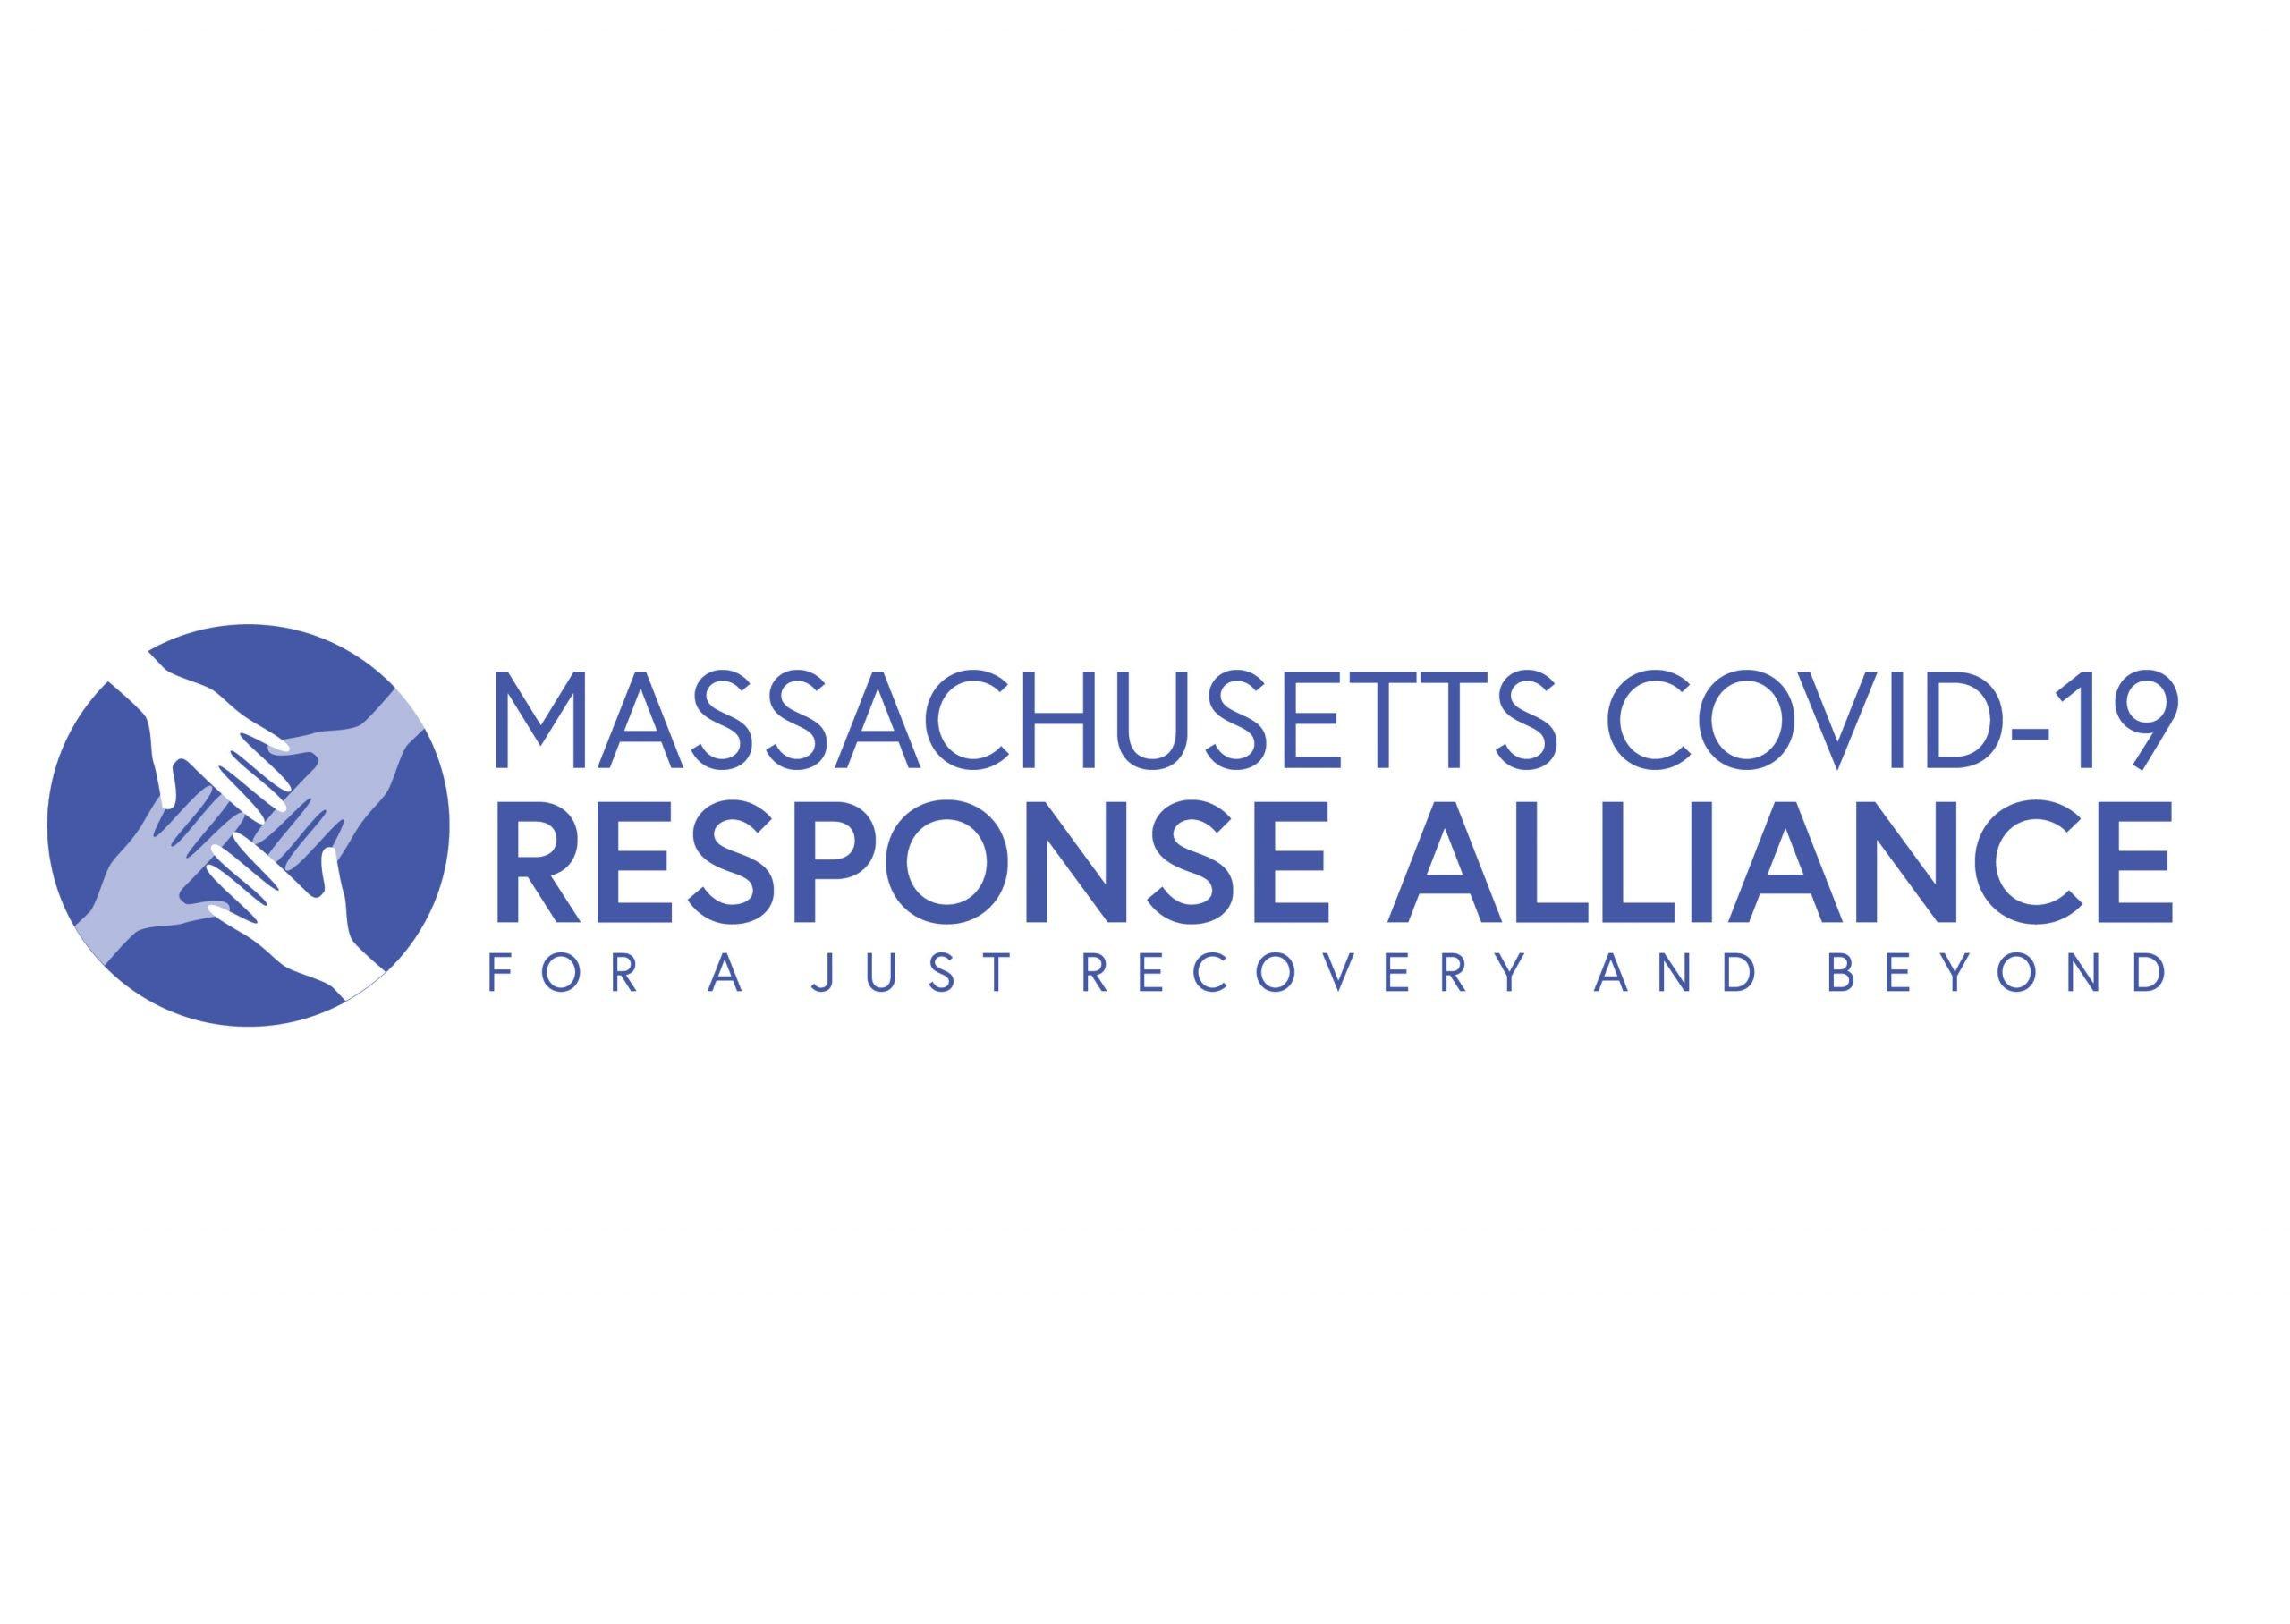 MASSACHUSETTS COVID-19 RESPONSE COALITION